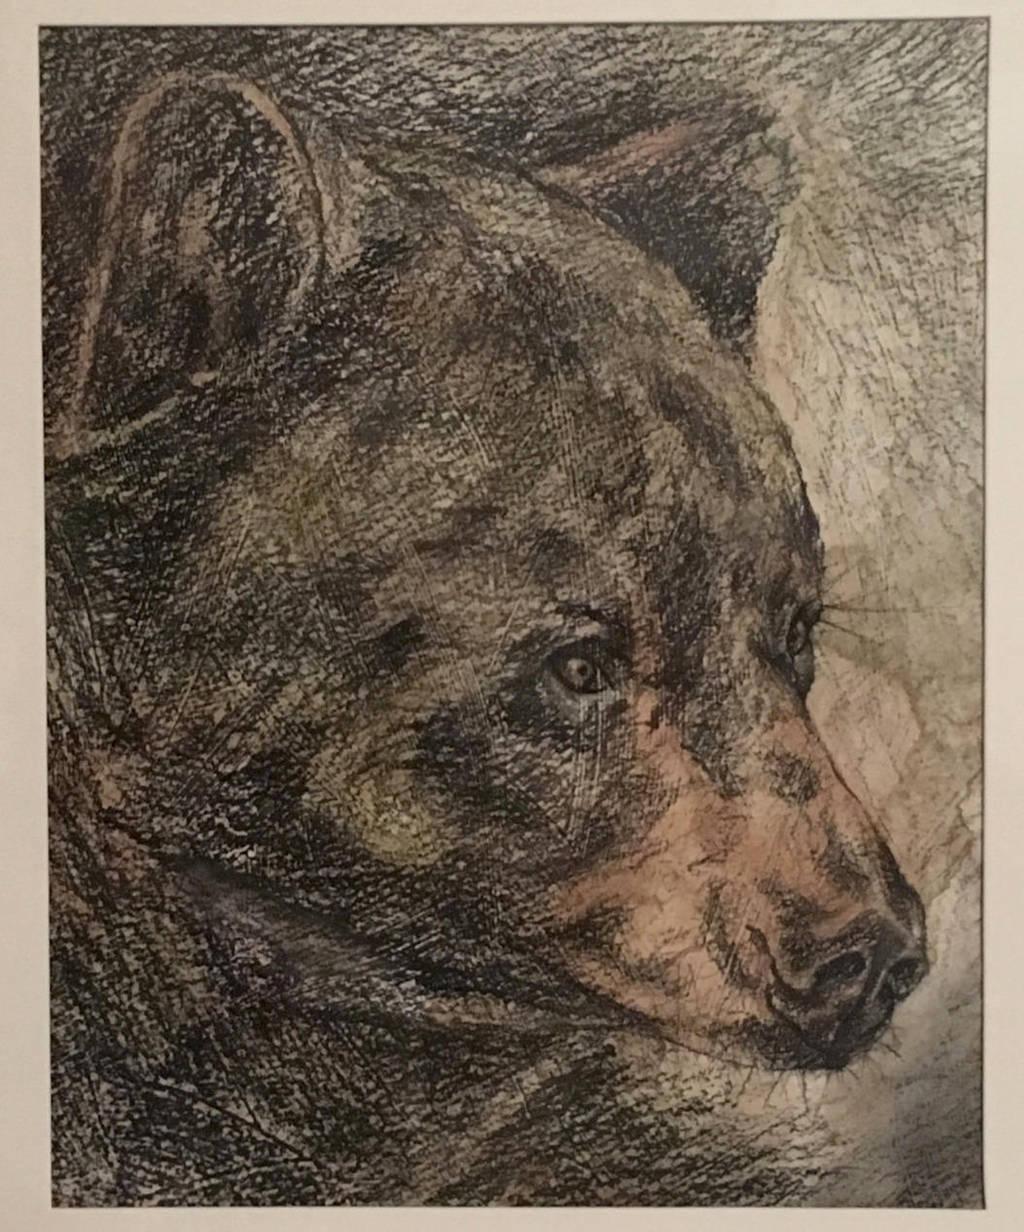 Black Bear by MaboroshiTira